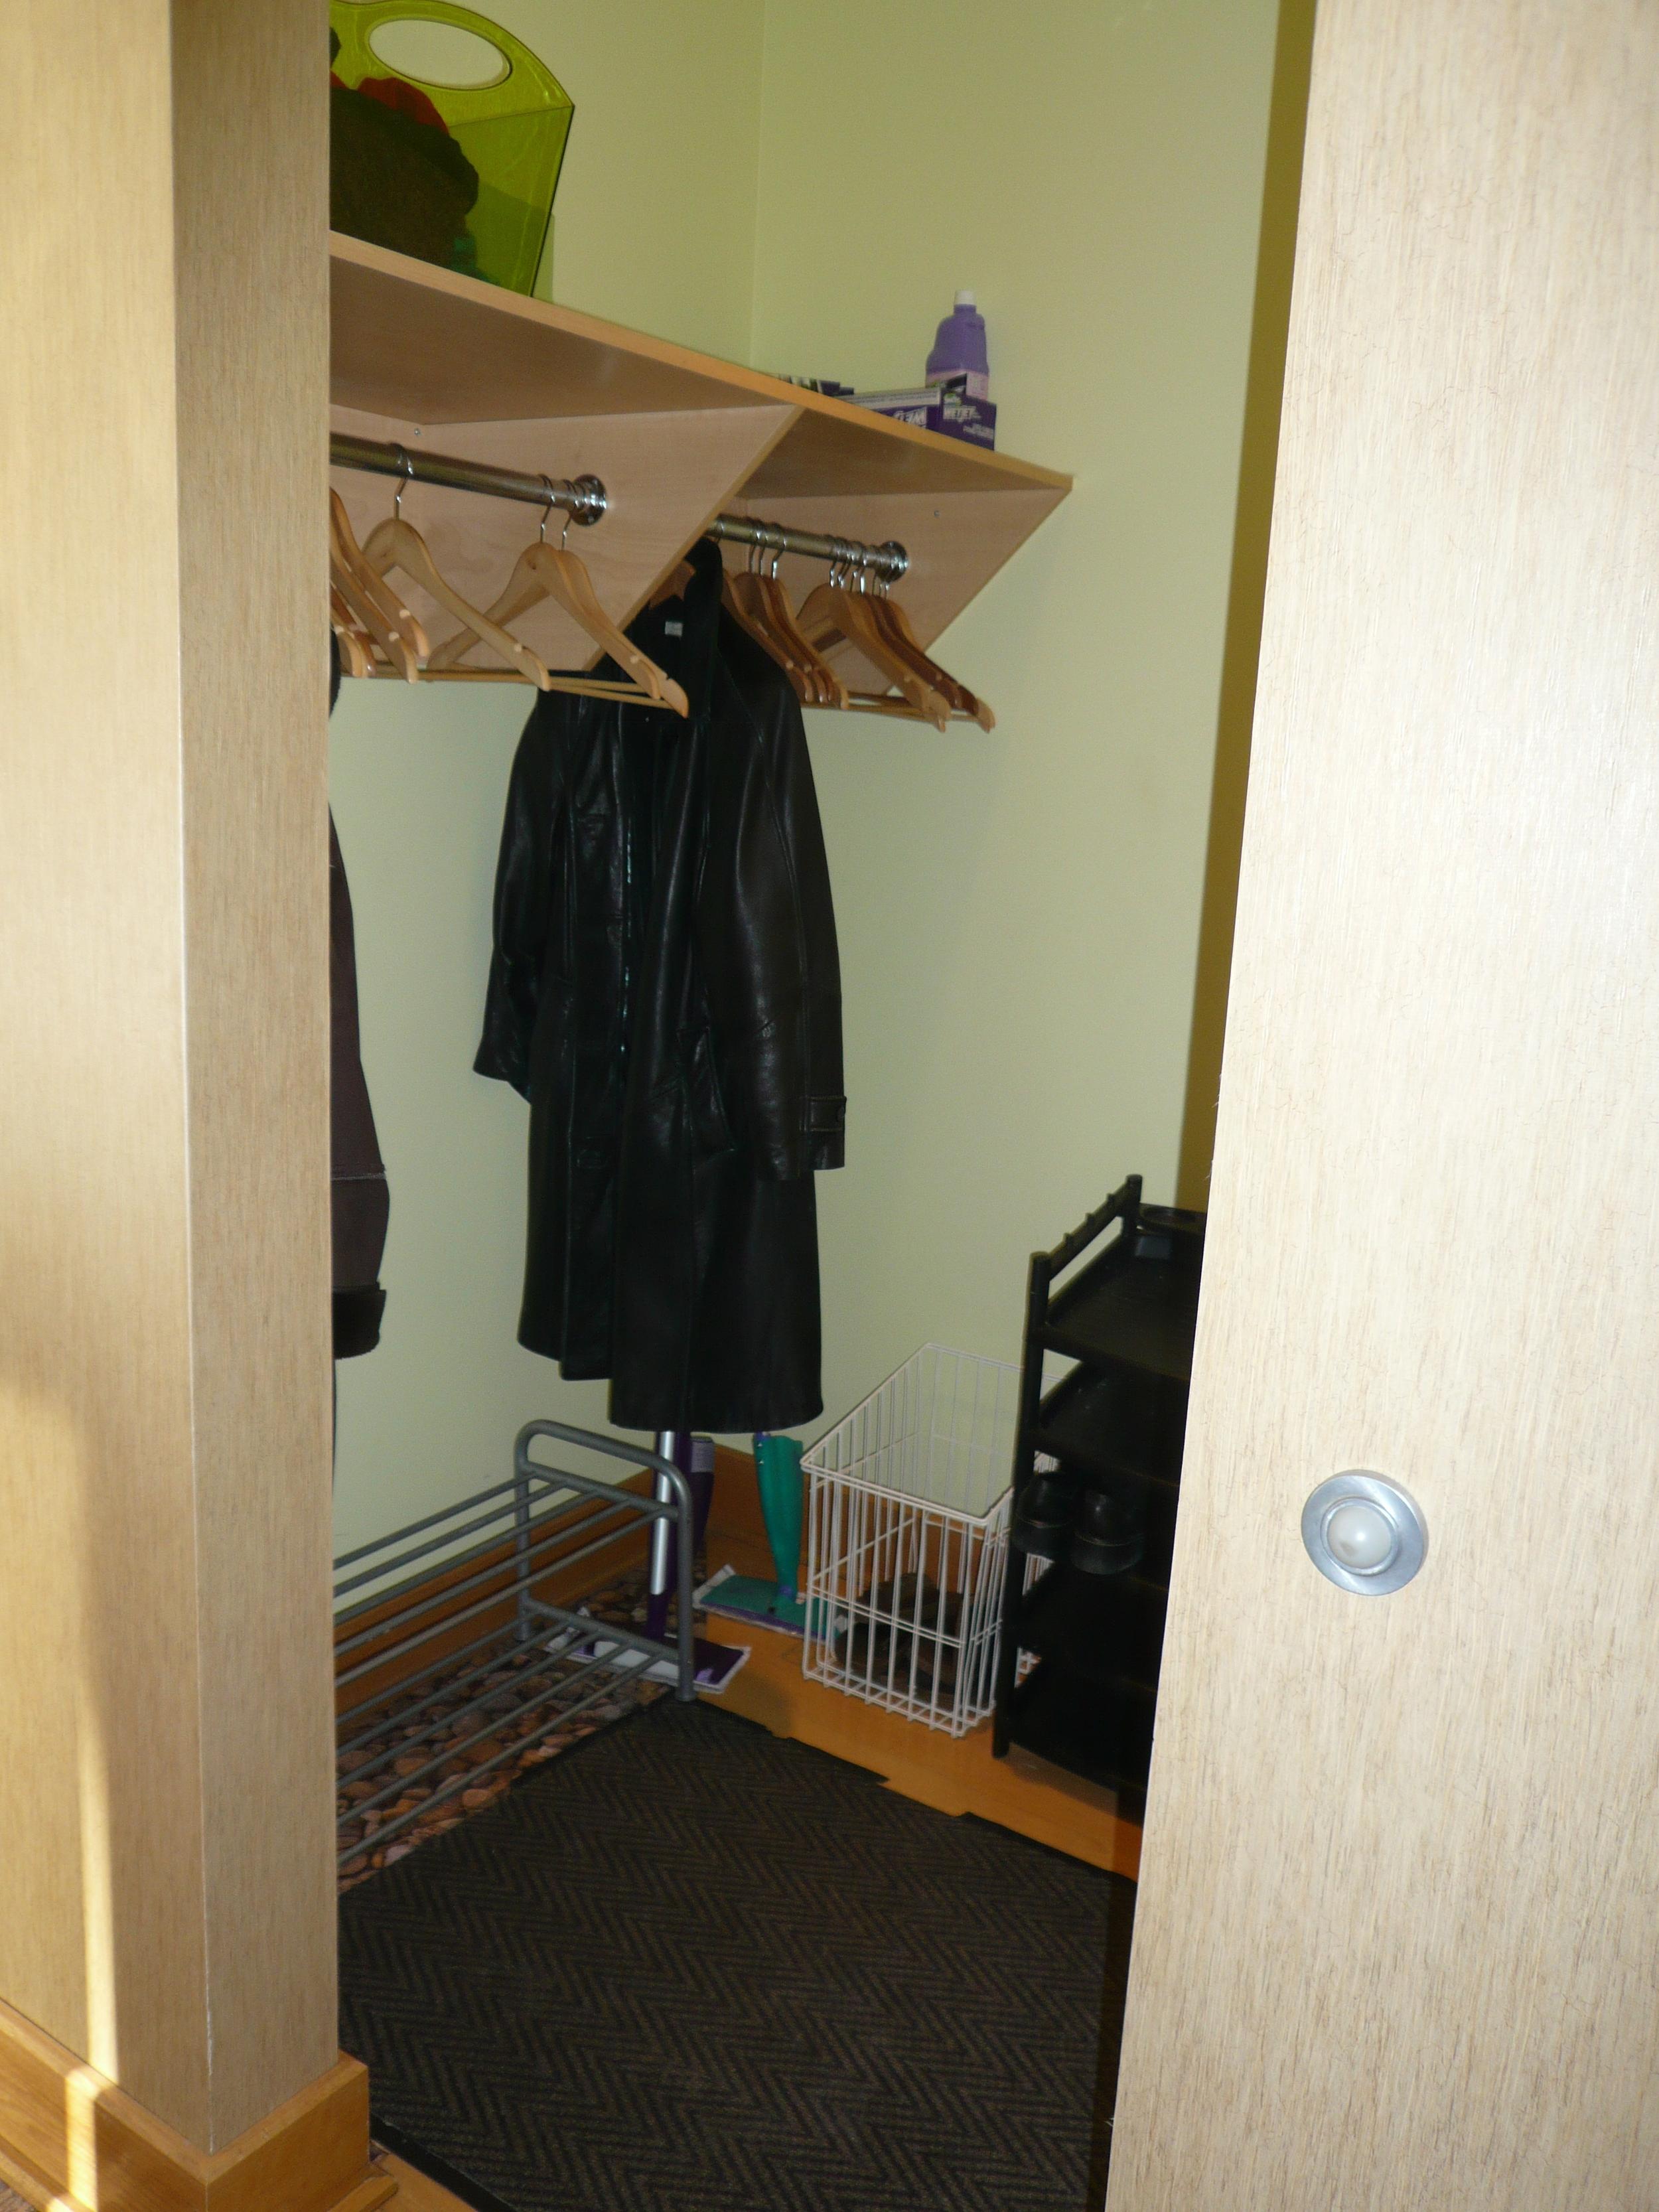 Sauna was created from a coat closet